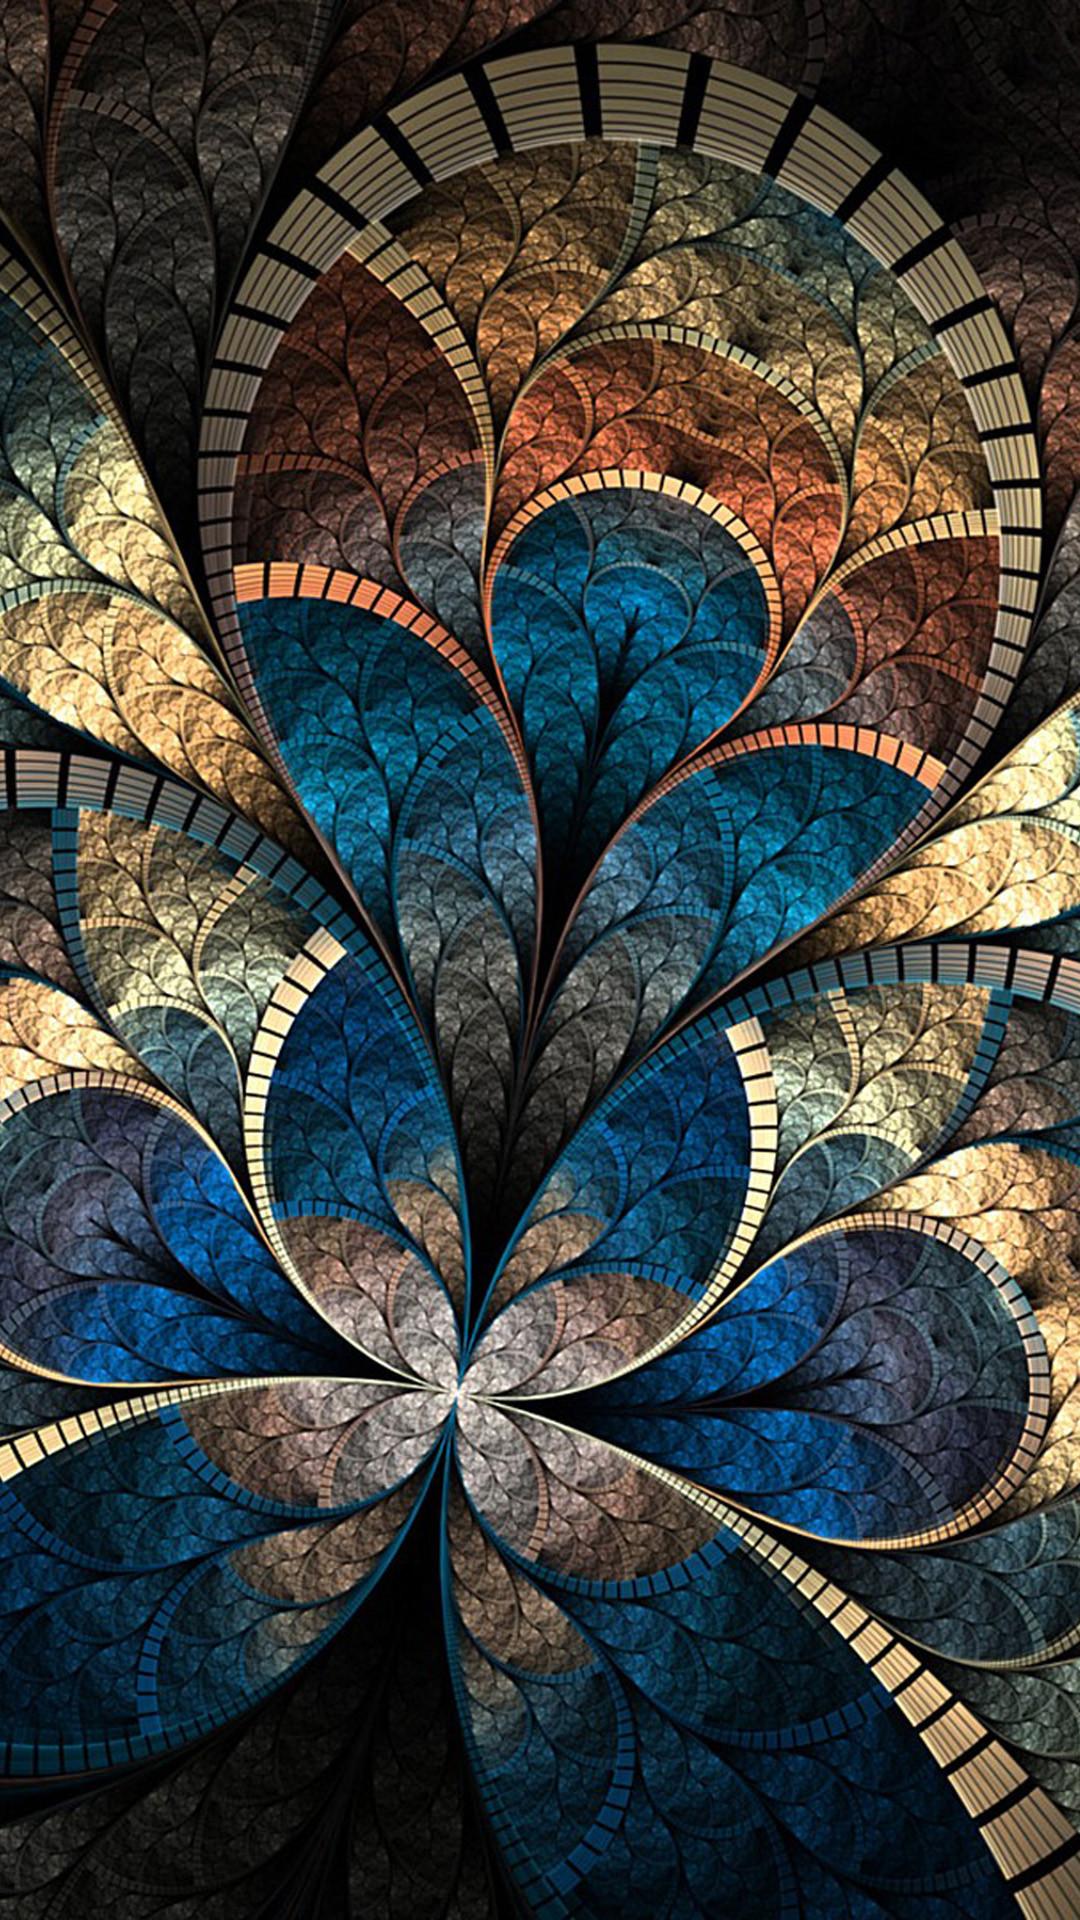 Abstract Wallpaper Iphone 1080x1920 Wallpaper Teahub Io